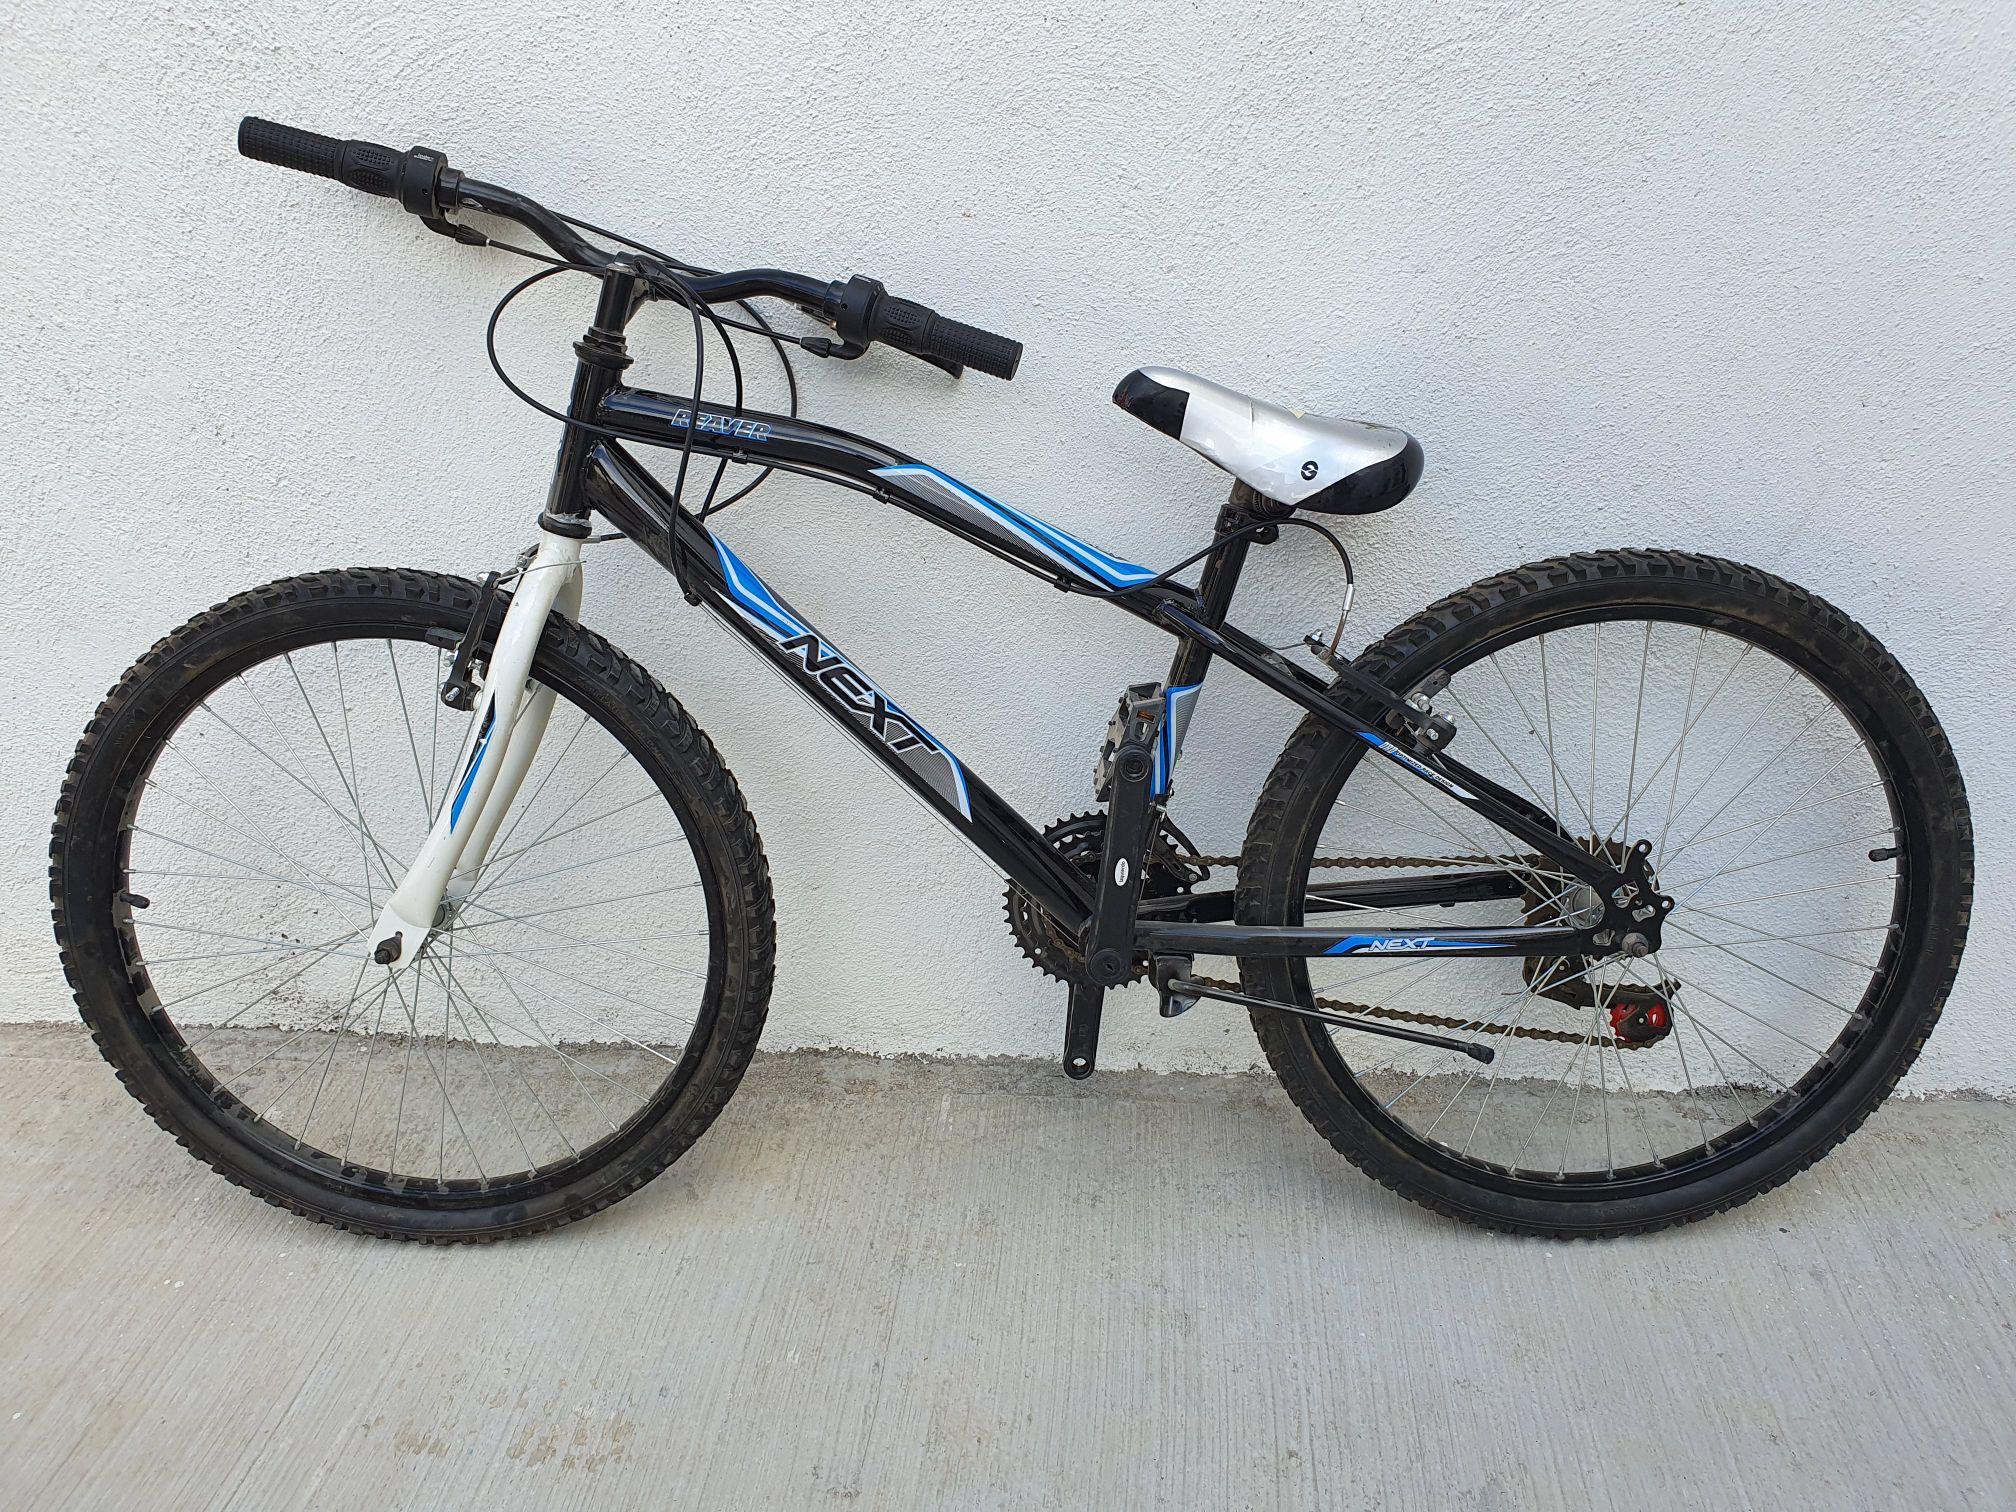 Bodega Aurrera Los Cabos: Bicicleta de montaña Next